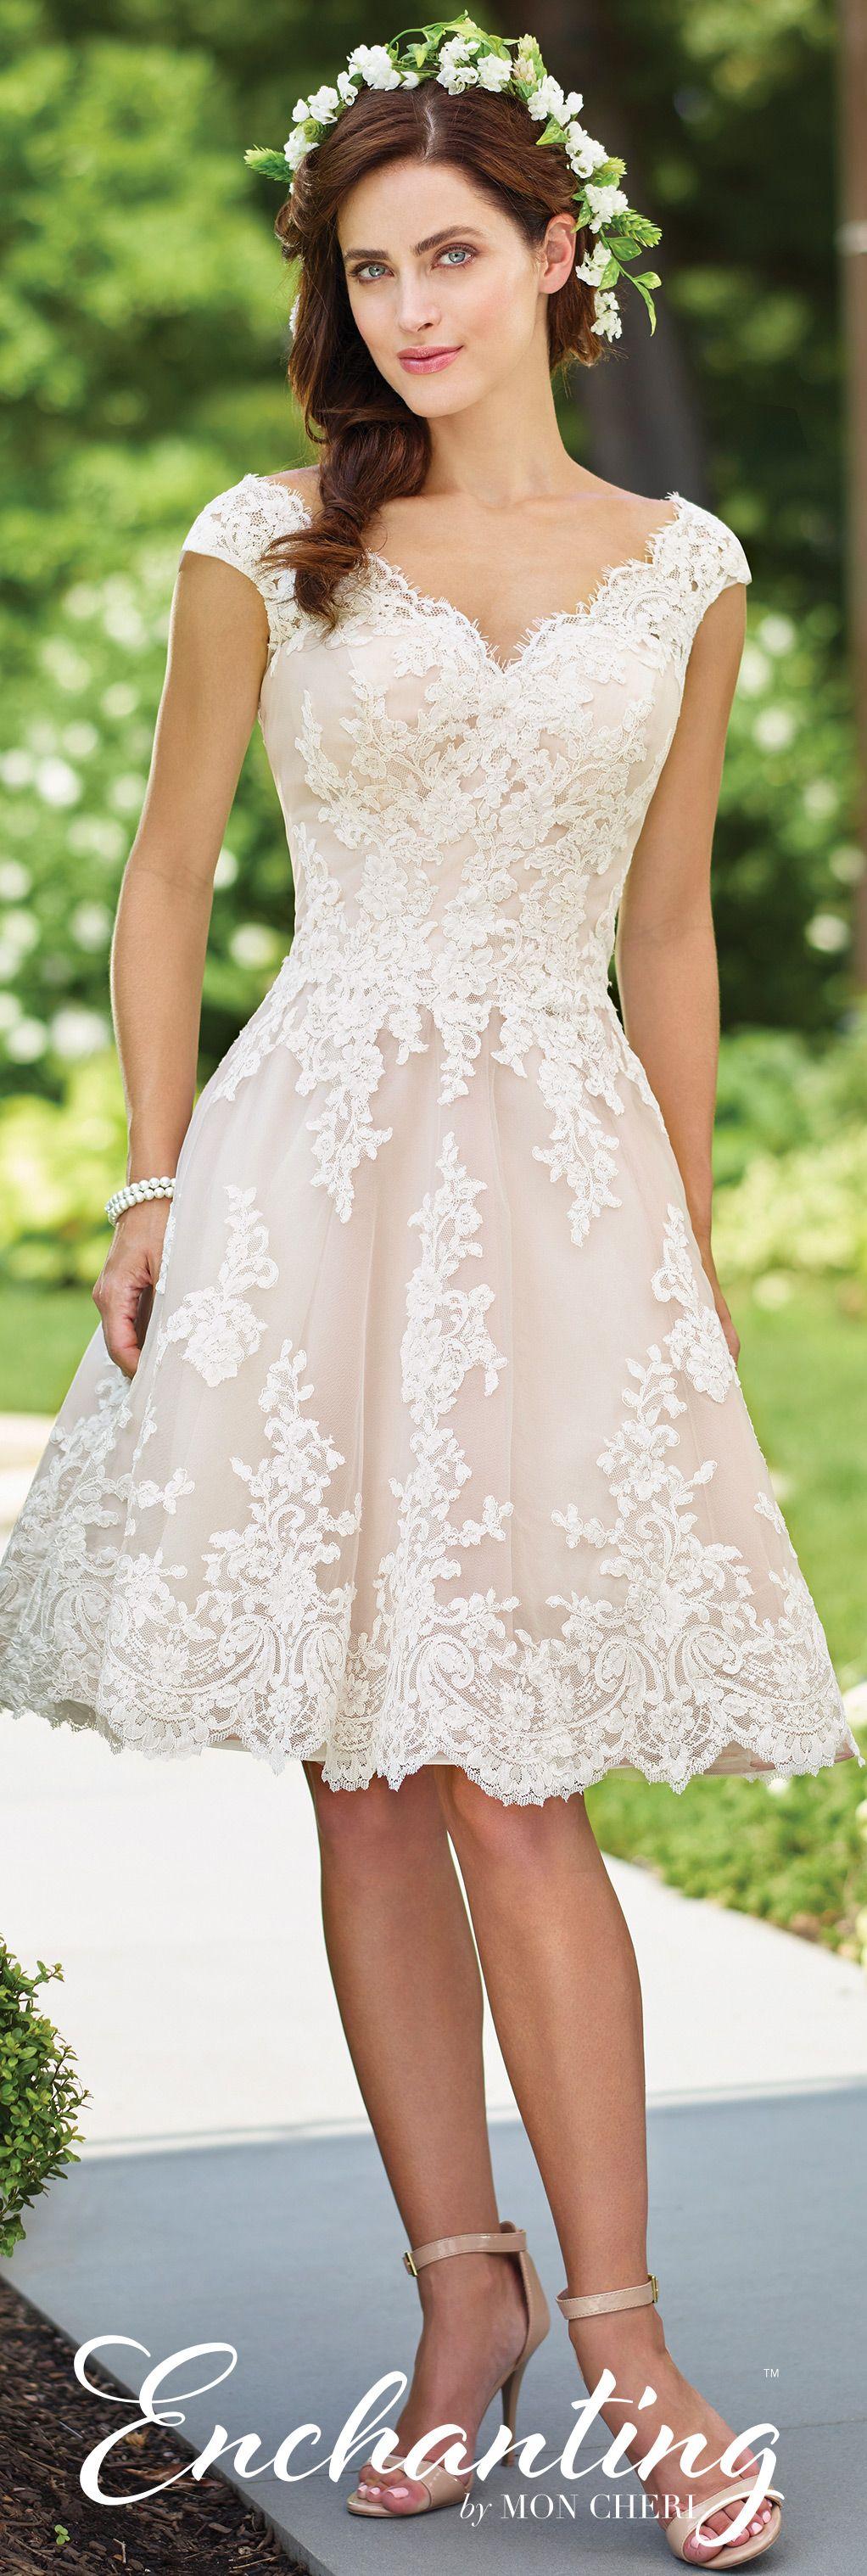 Knee Length Wedding Dress  Enchanting by Mon Cheri  Short